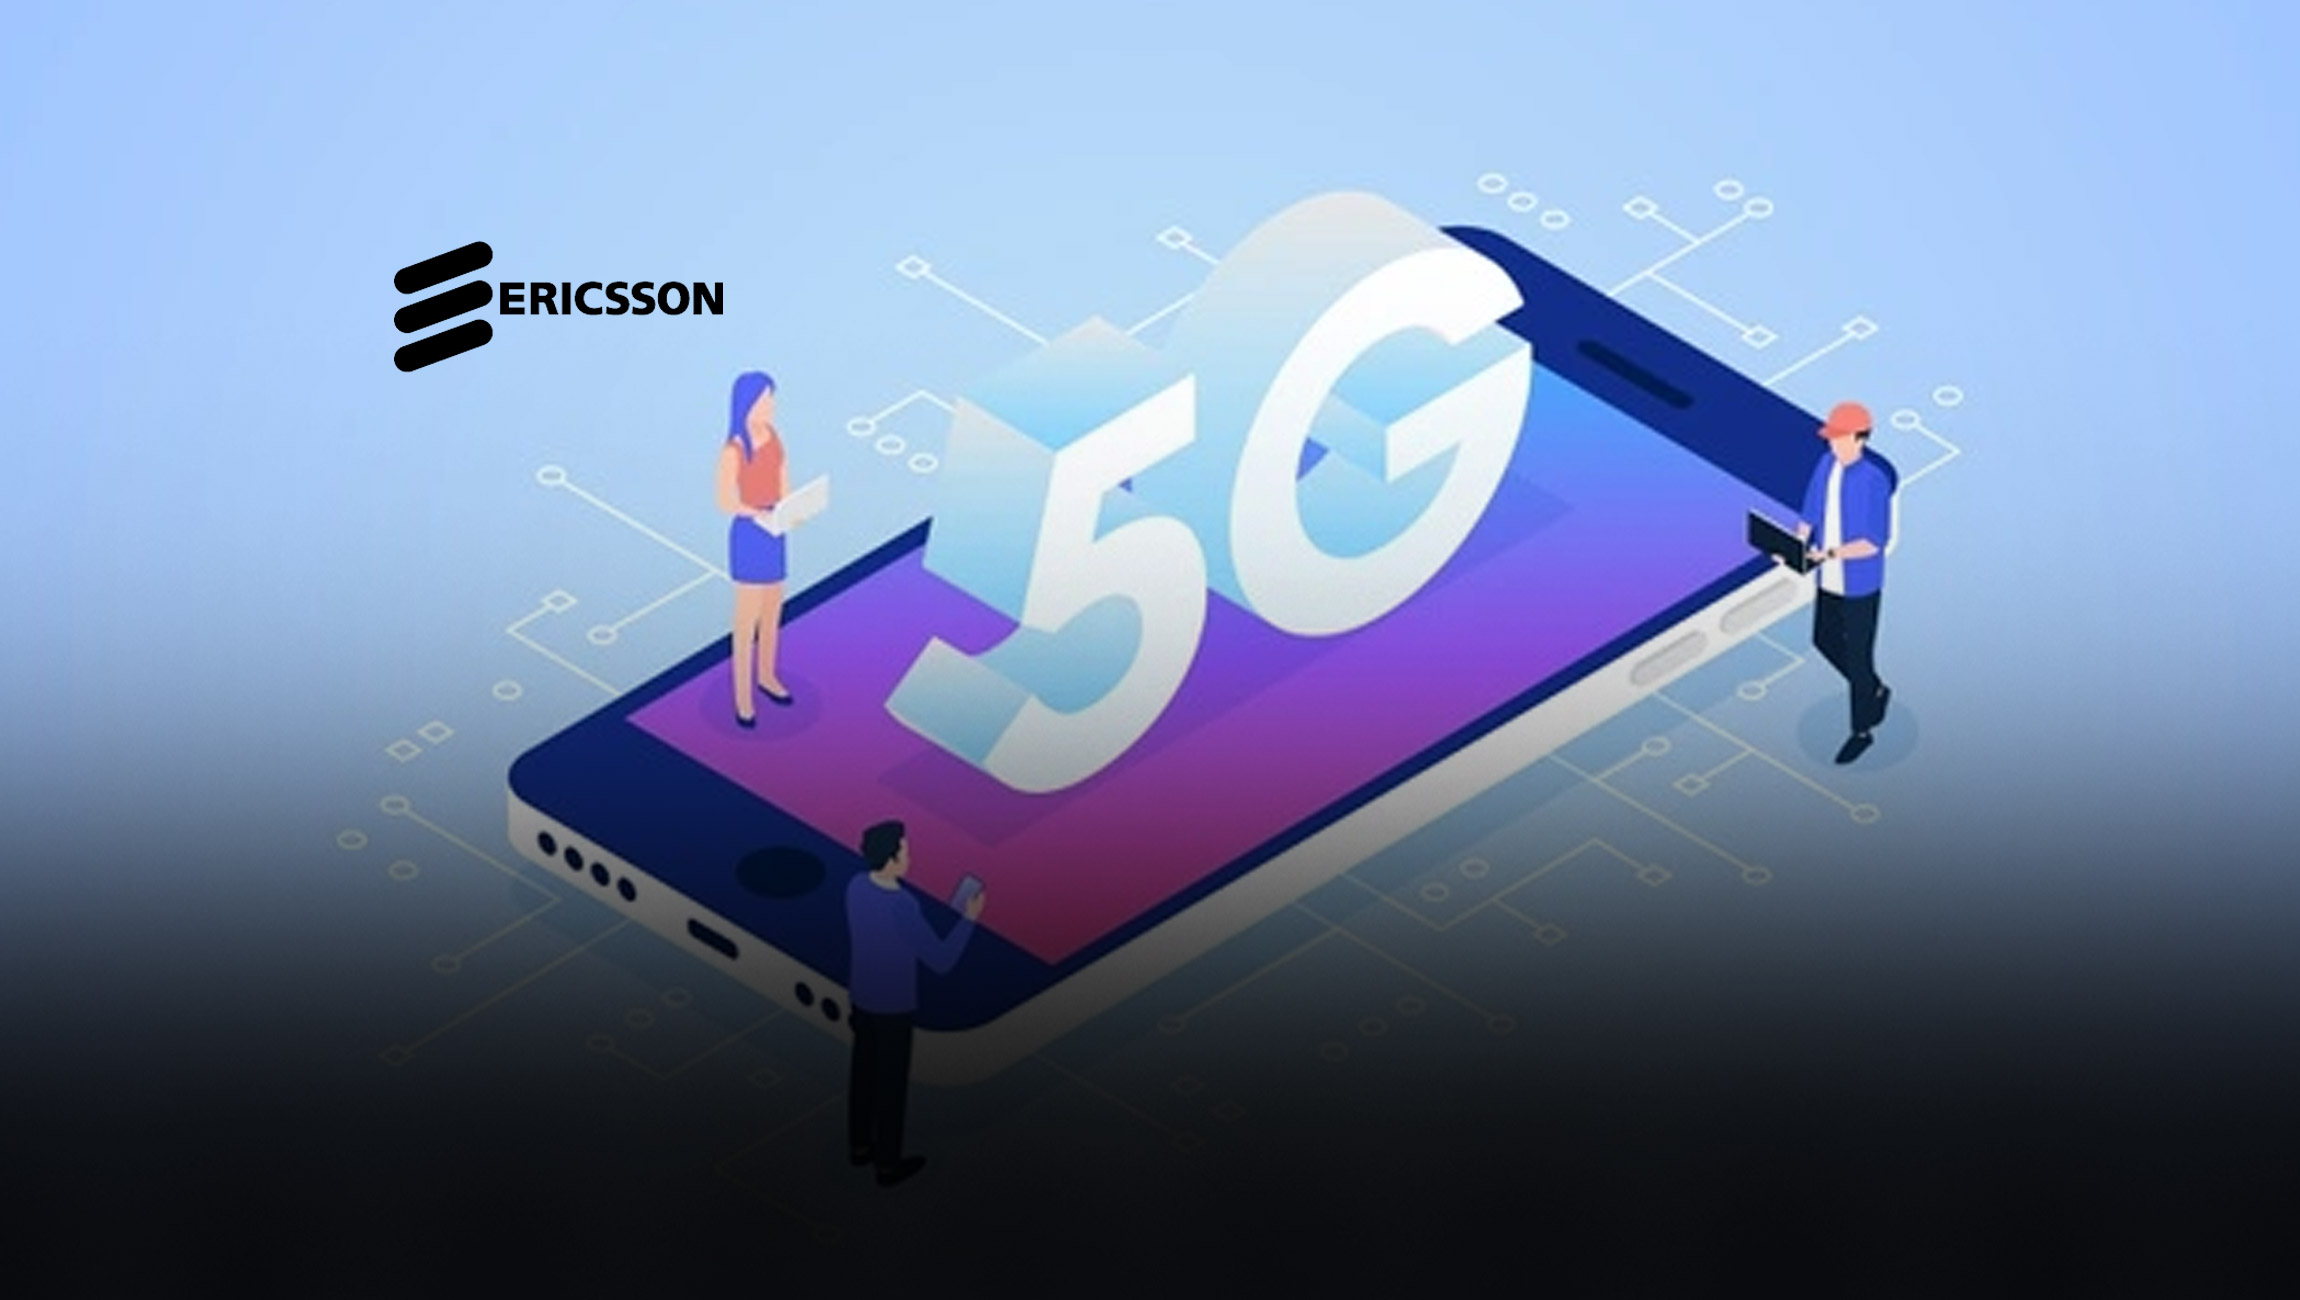 Ericsson estimates USD 31 trillion 5G consumer market by 2030